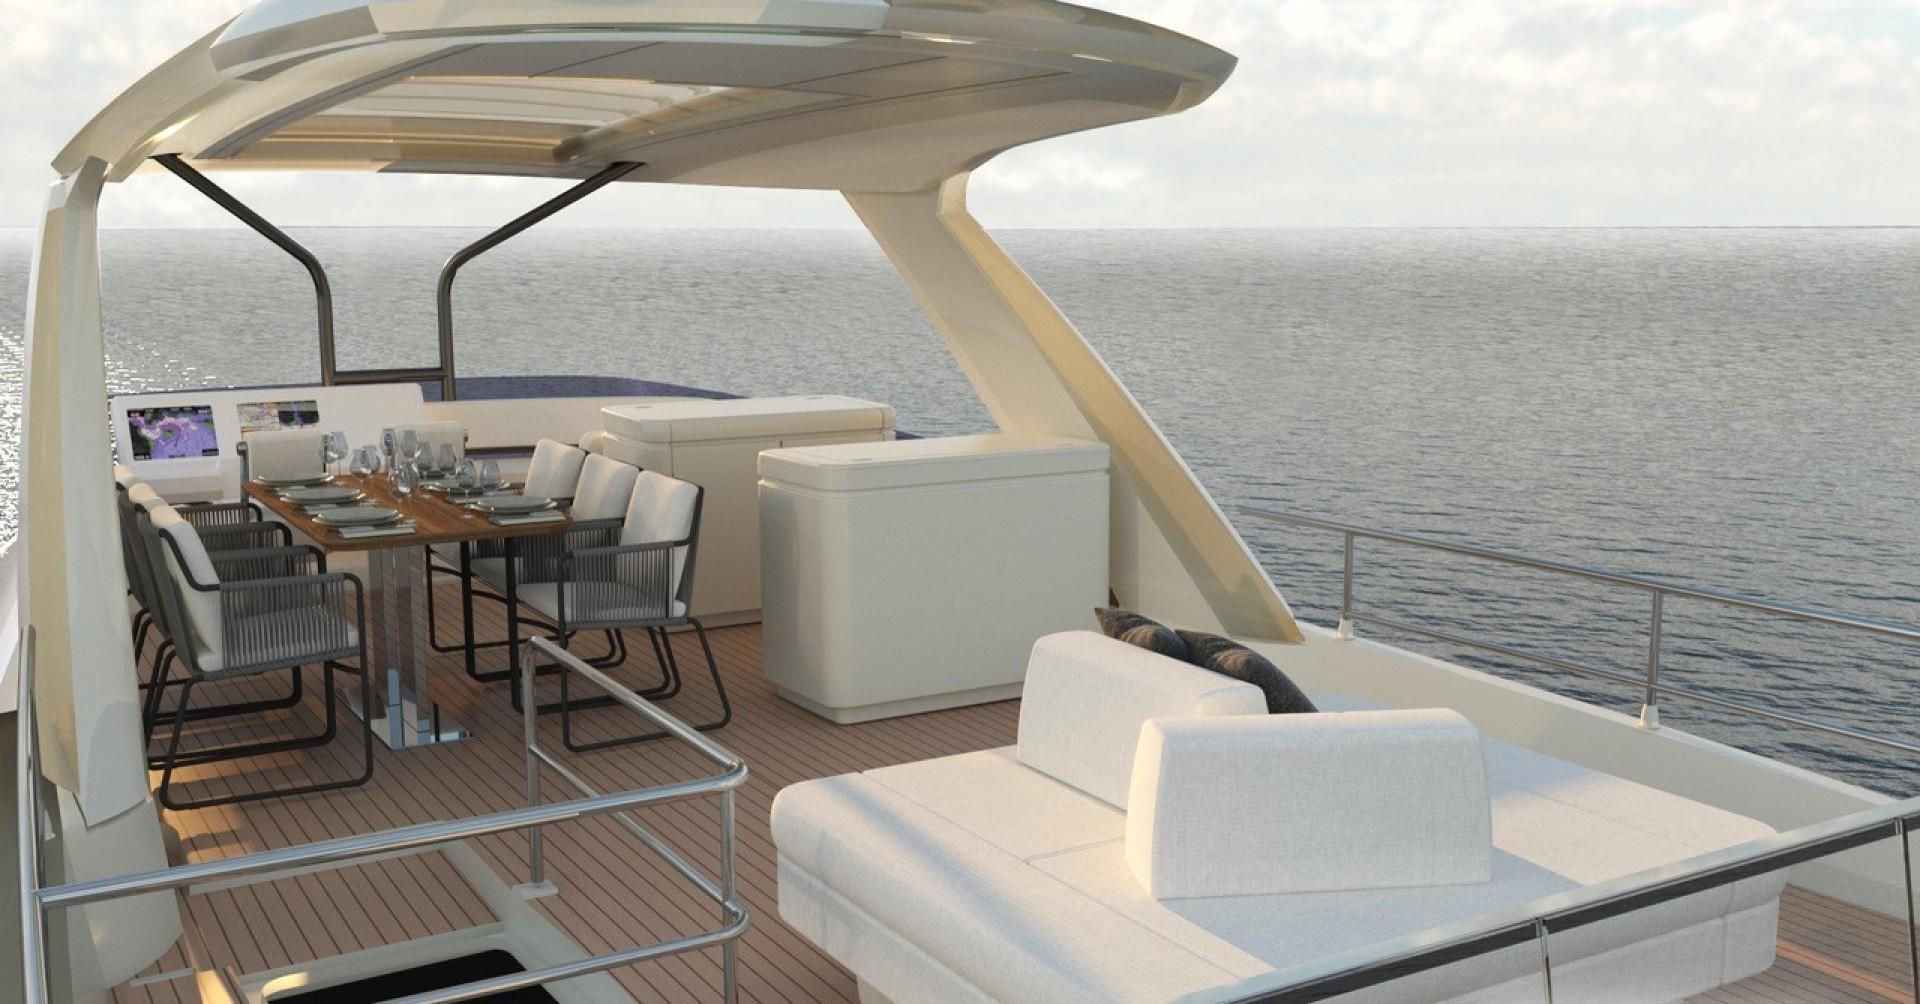 Prestige-690 2021 -Fort Lauderdale-Florida-United States-1611961 | Thumbnail